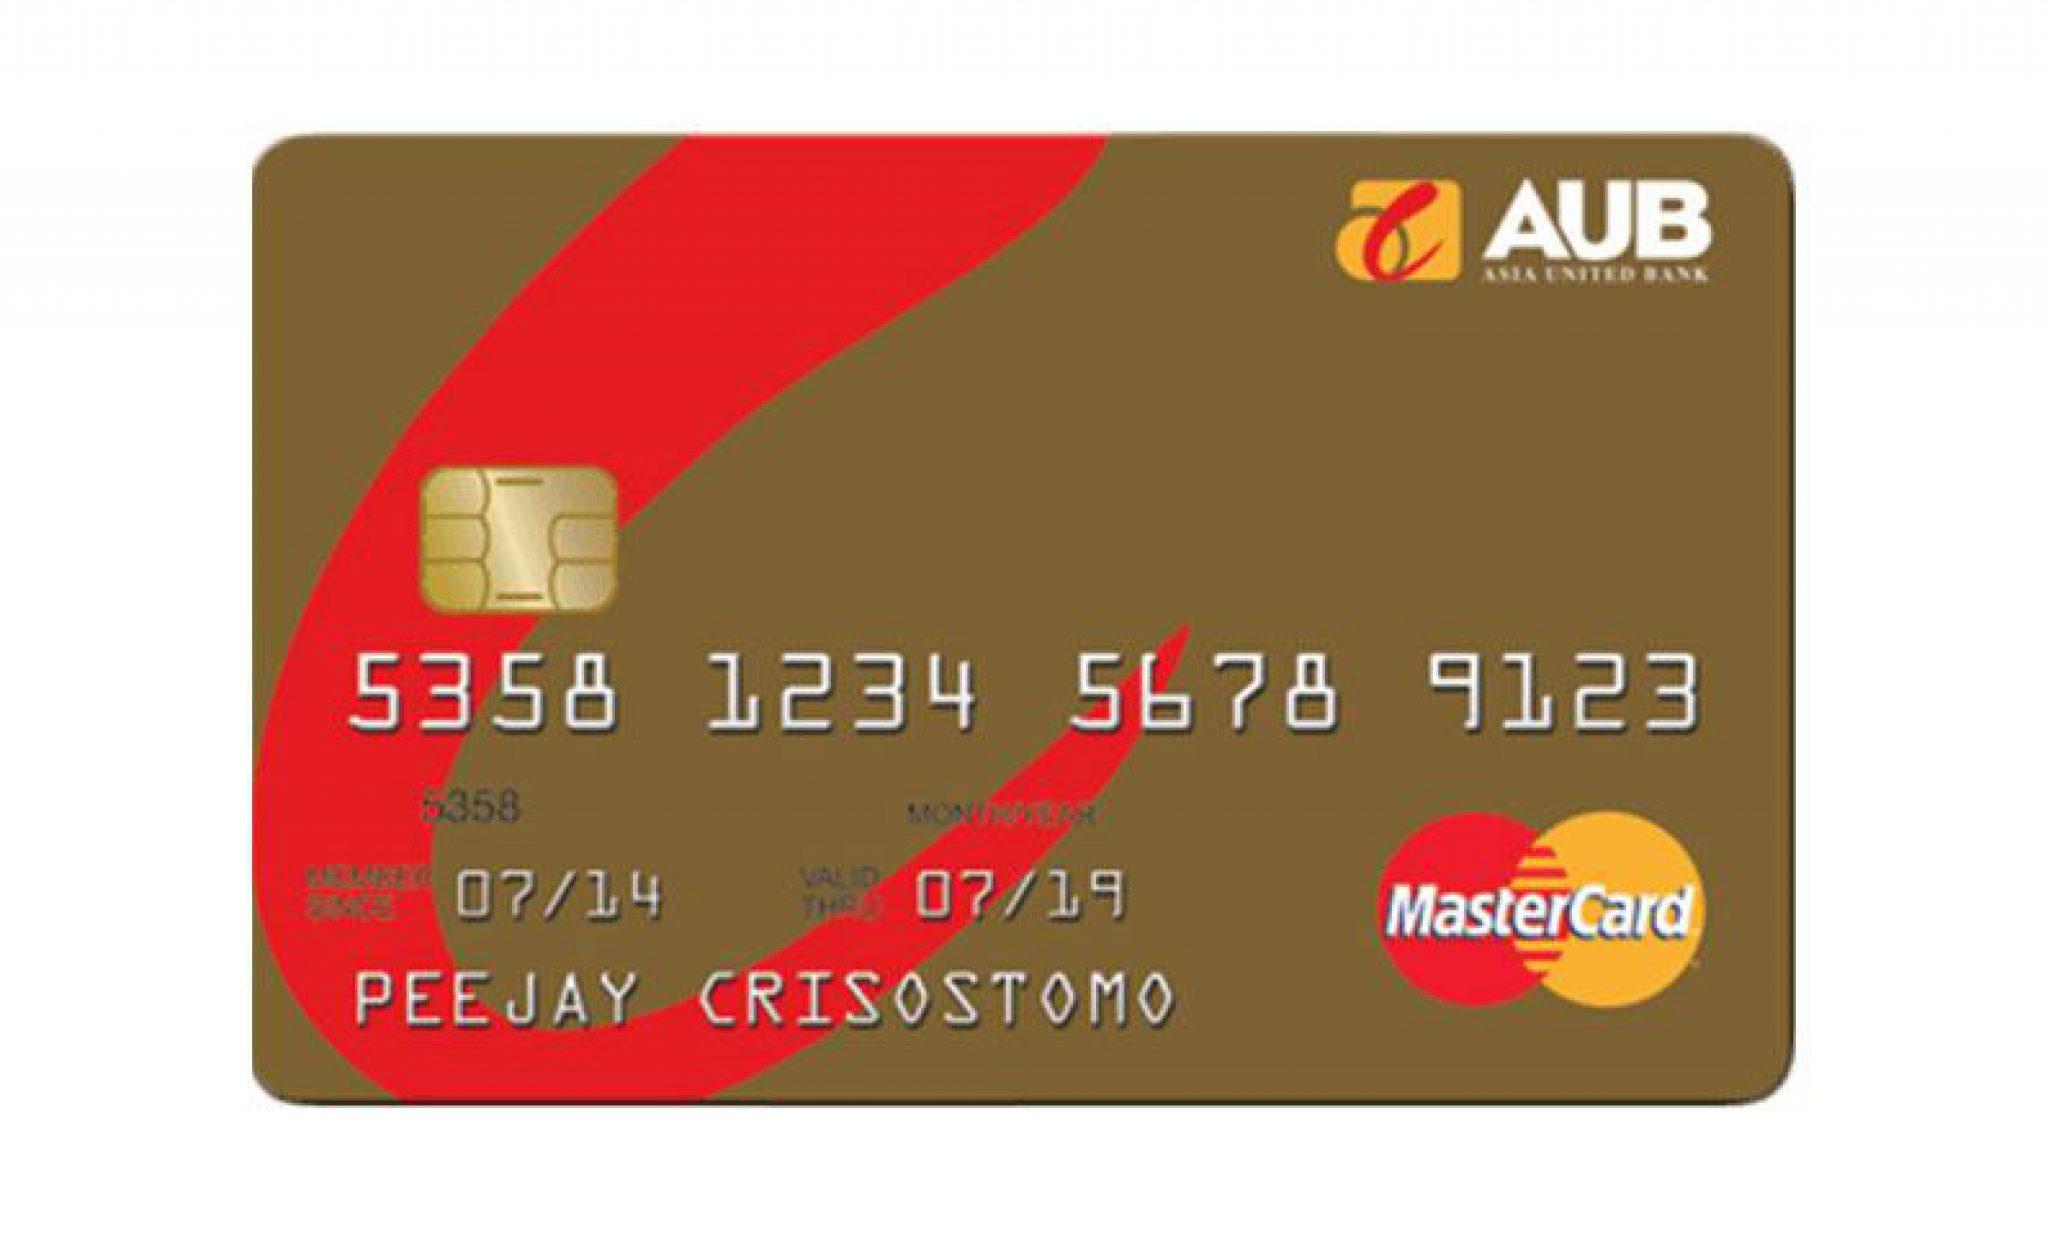 AUB Gold Mastercard